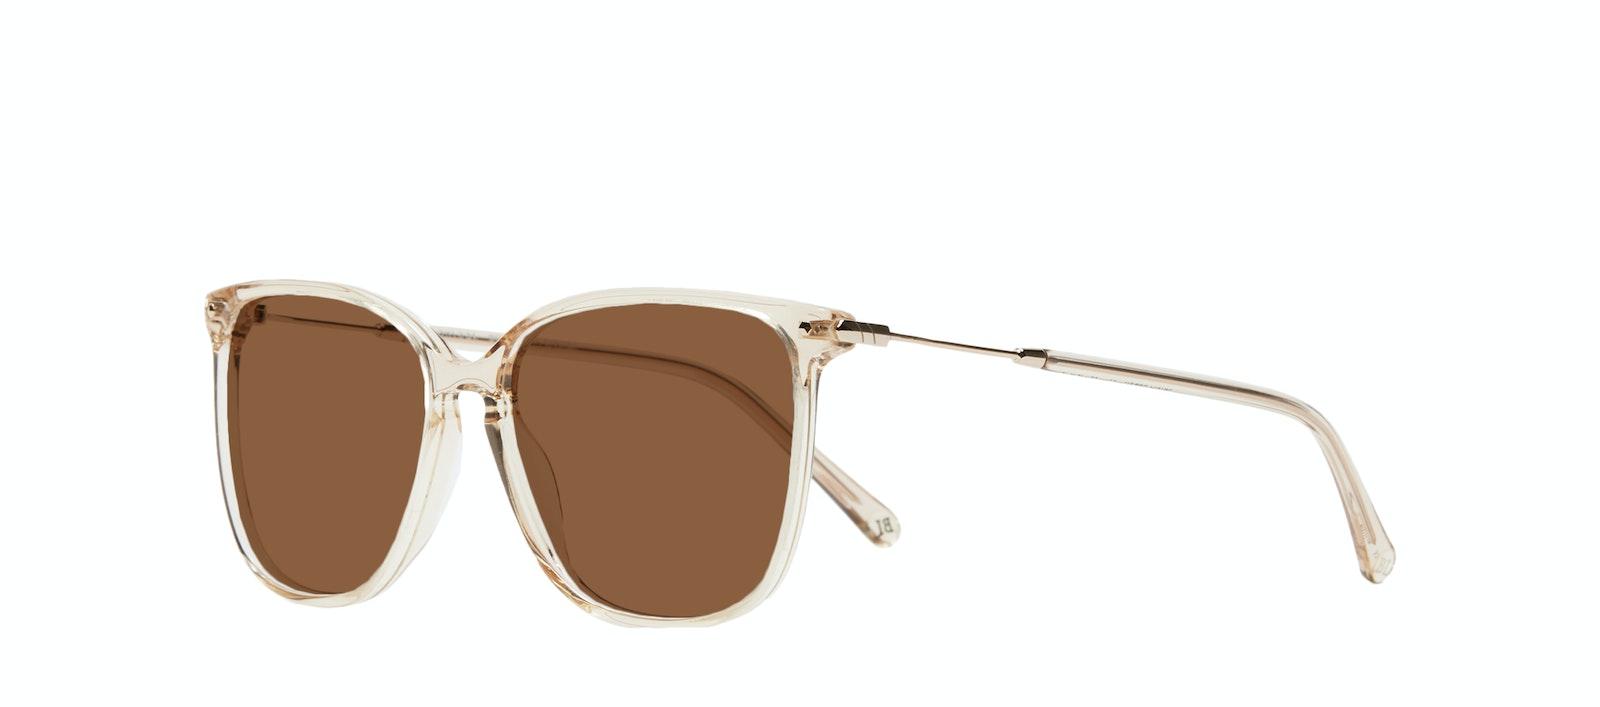 Affordable Fashion Glasses Square Sunglasses Women Sonia XS Blush Tilt